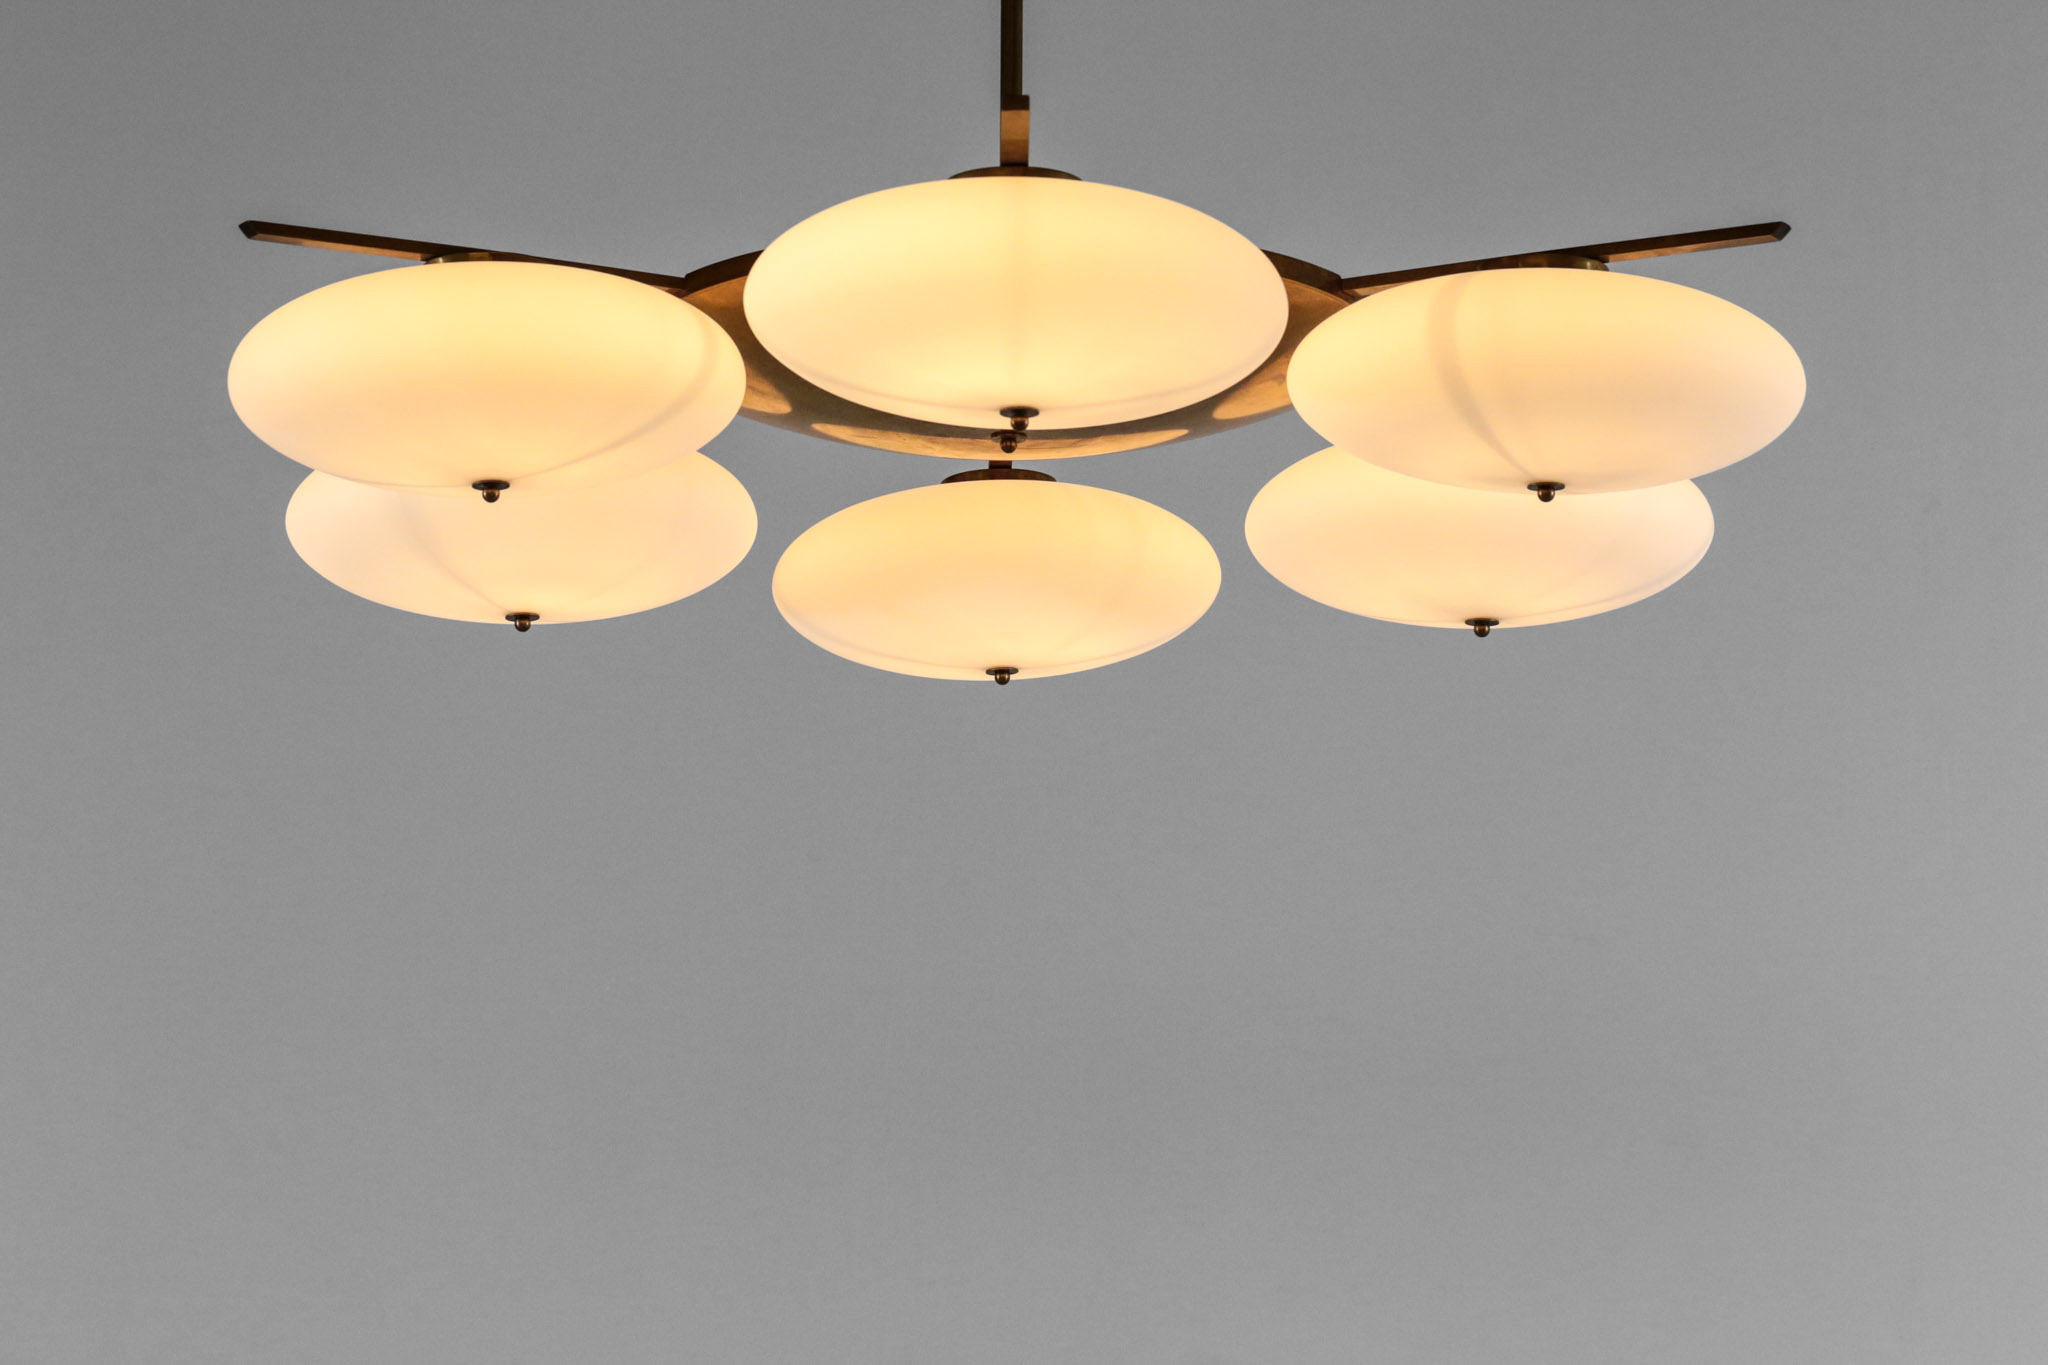 grand lustre plafonnier design 6 opalines ovoides style. Black Bedroom Furniture Sets. Home Design Ideas